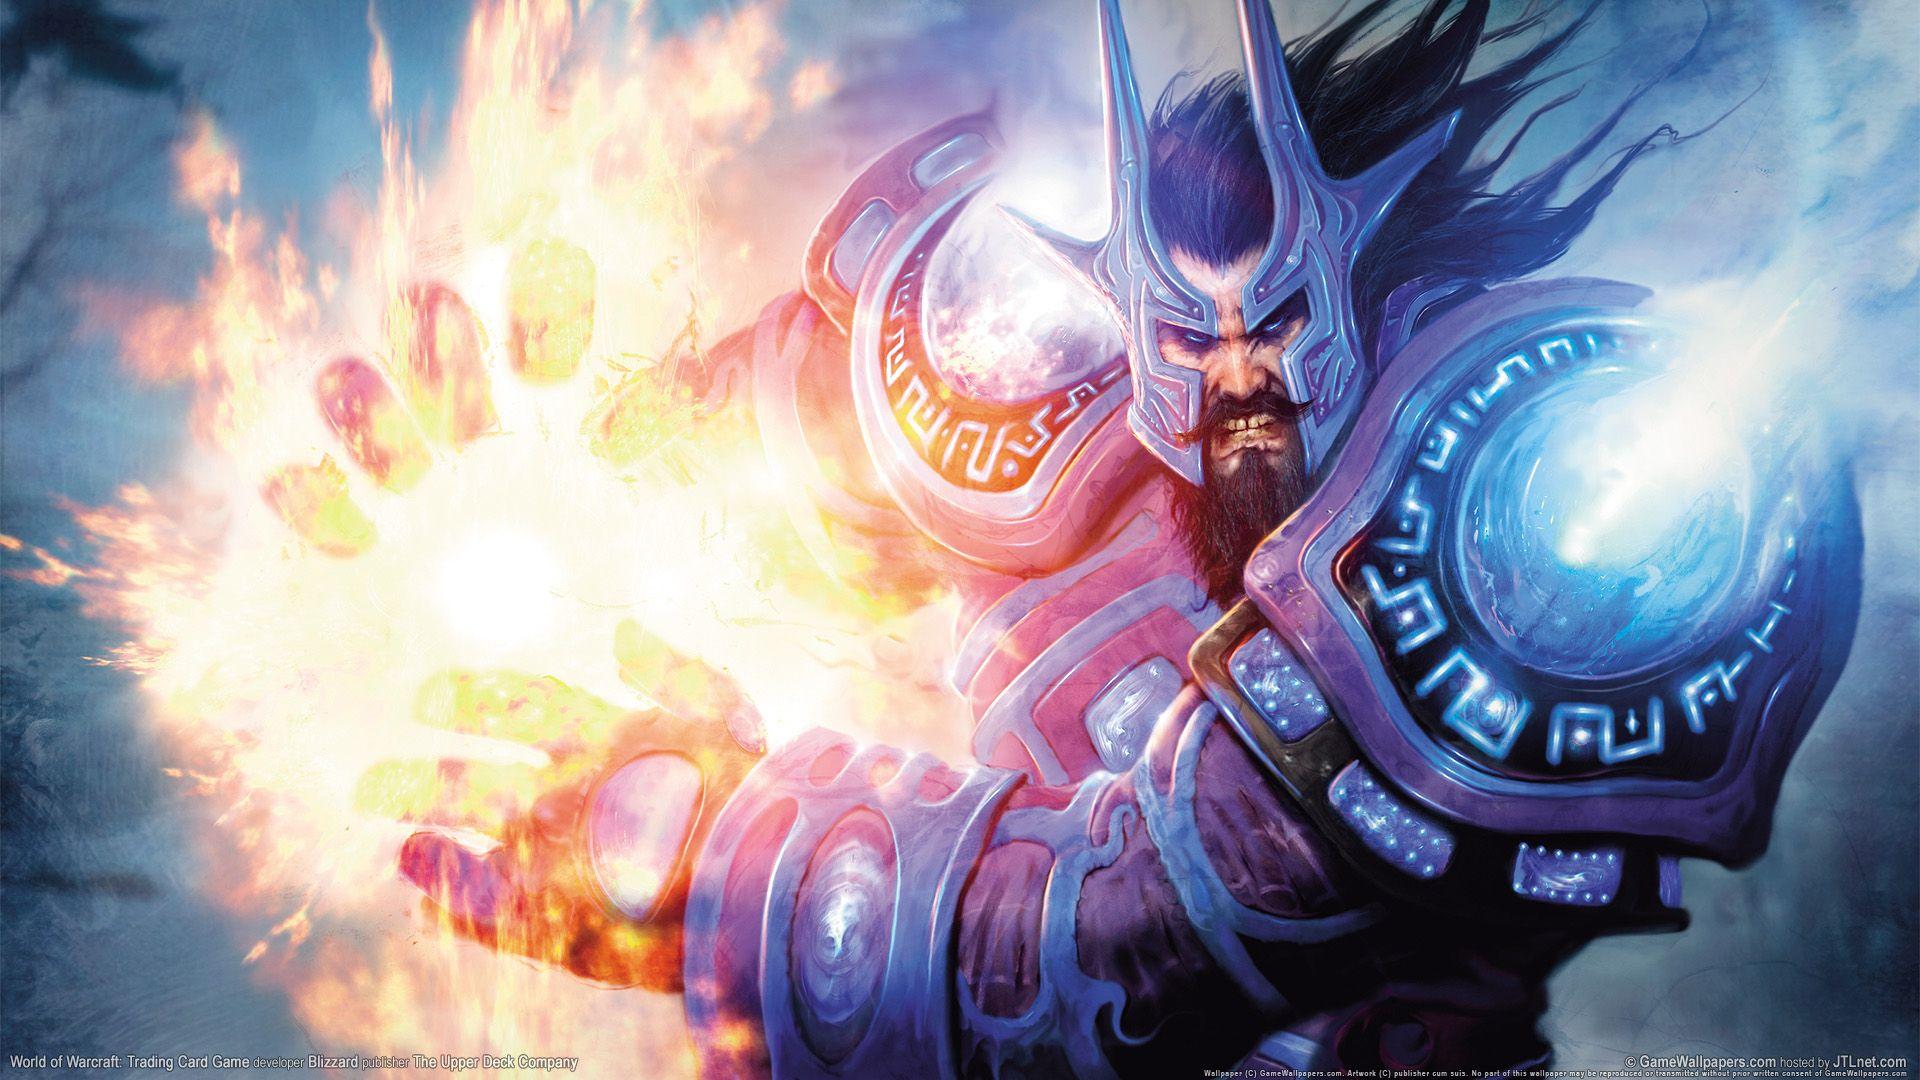 Mage WoW wallpaper World of Warcraft Pinterest